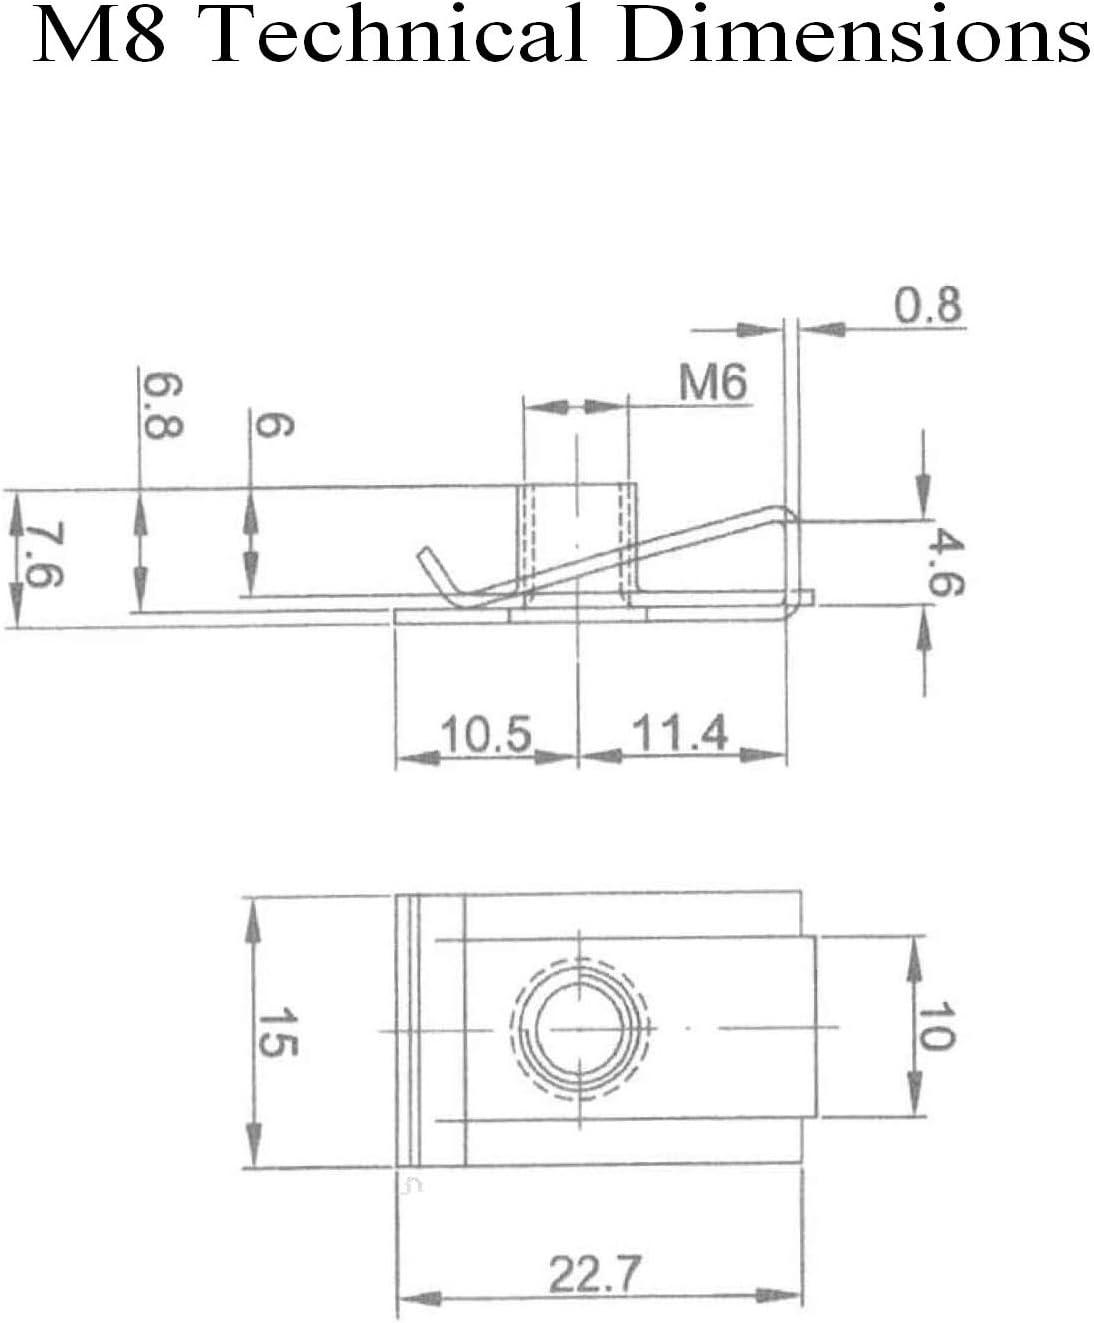 10 x Clips Speed Fastener Chimney U Nuts Autotaraudeuse M/étrique Vis Lug Spire M5